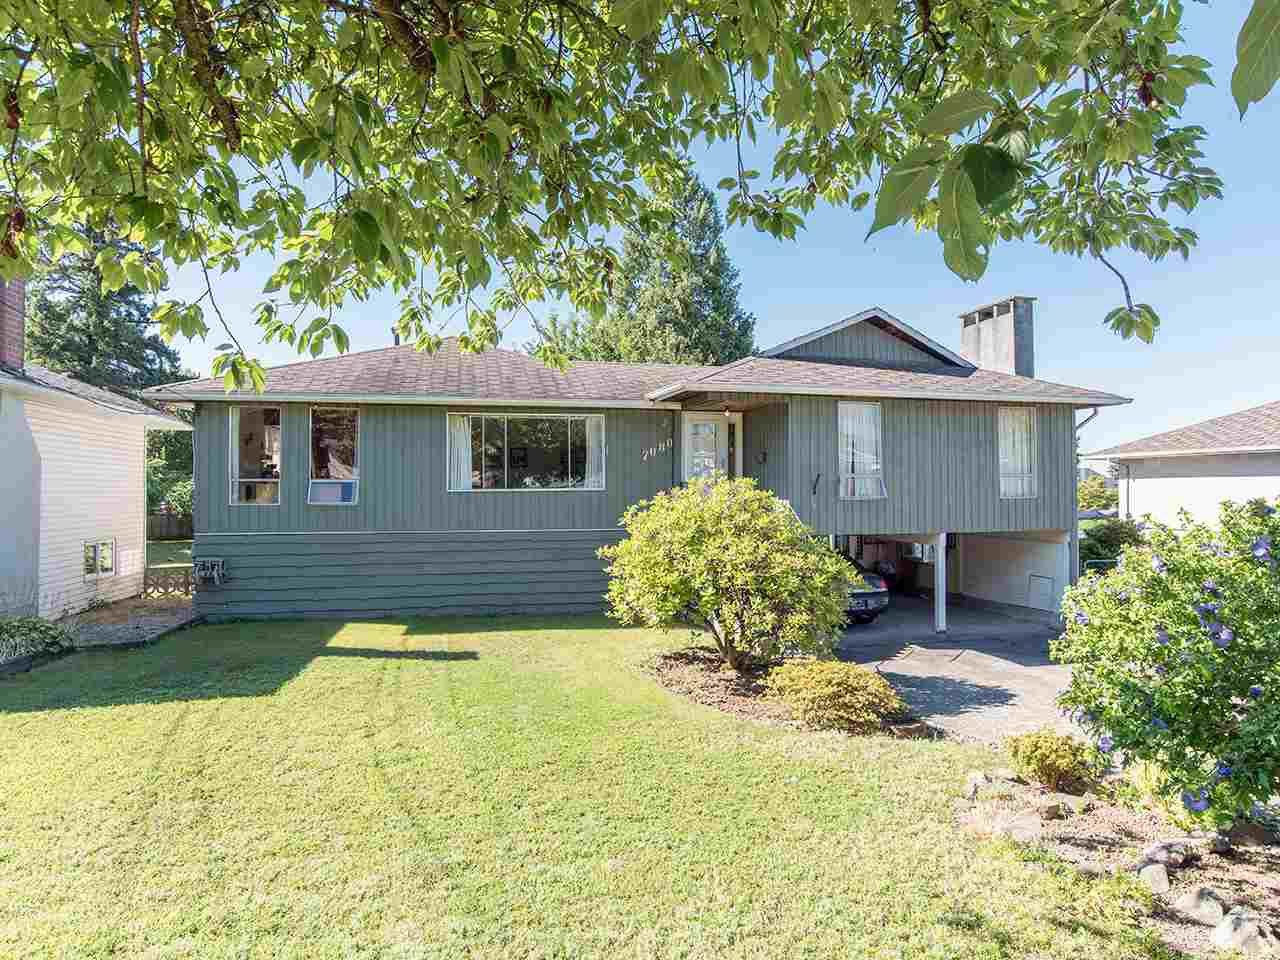 Main Photo: 7080 CURTIS Street in Burnaby: Westridge BN House for sale (Burnaby North)  : MLS®# R2481335